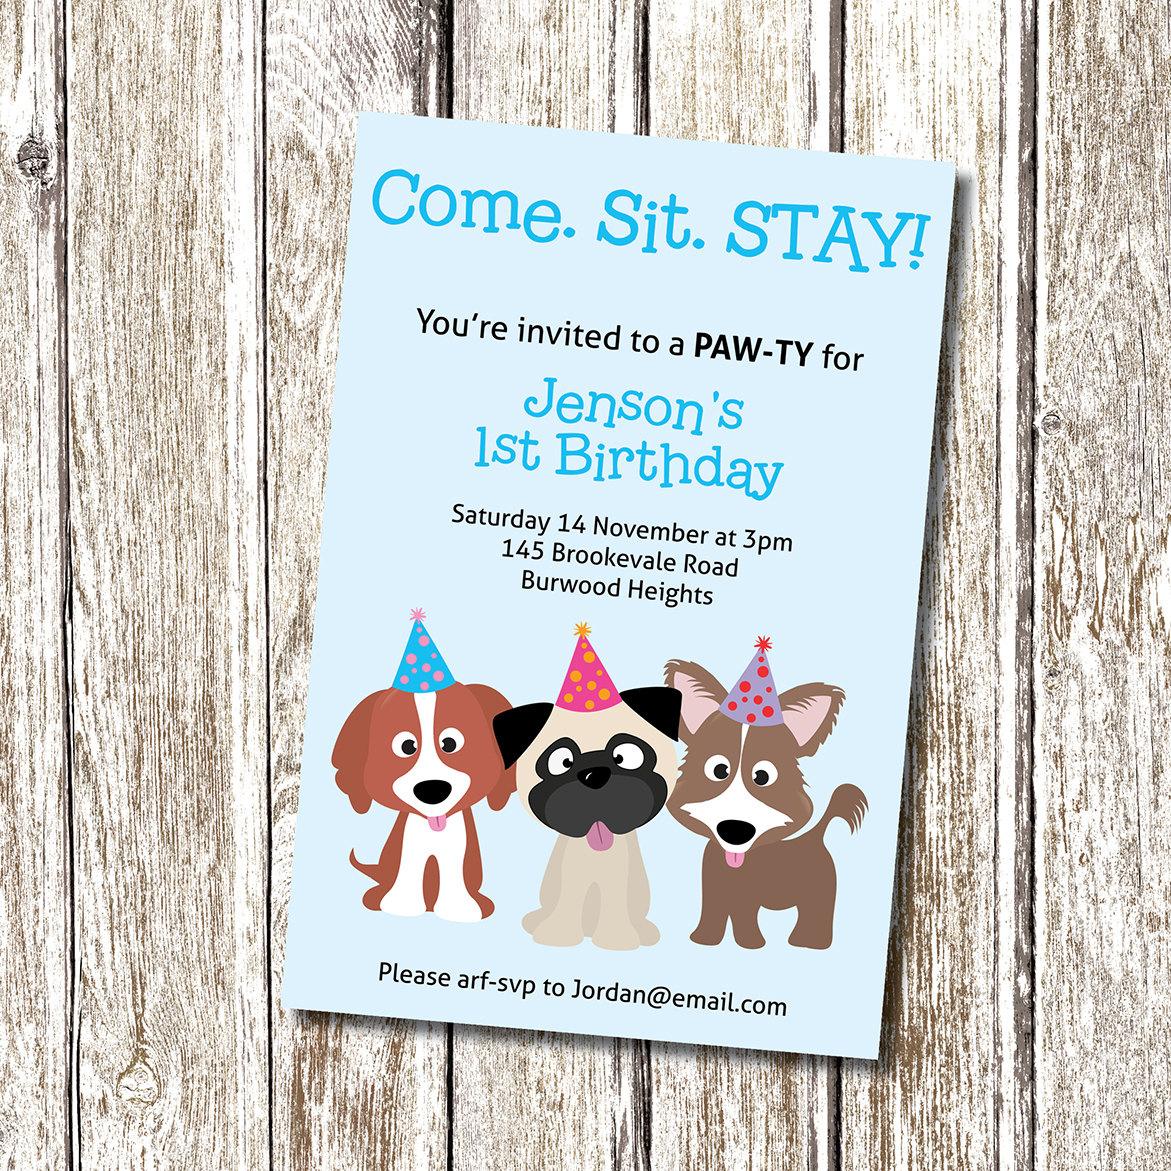 Puppy Dog Party Free Printable Invitations Edbd B C Ecc Luxury Puppy - Free Printable Puppy Dog Birthday Invitations